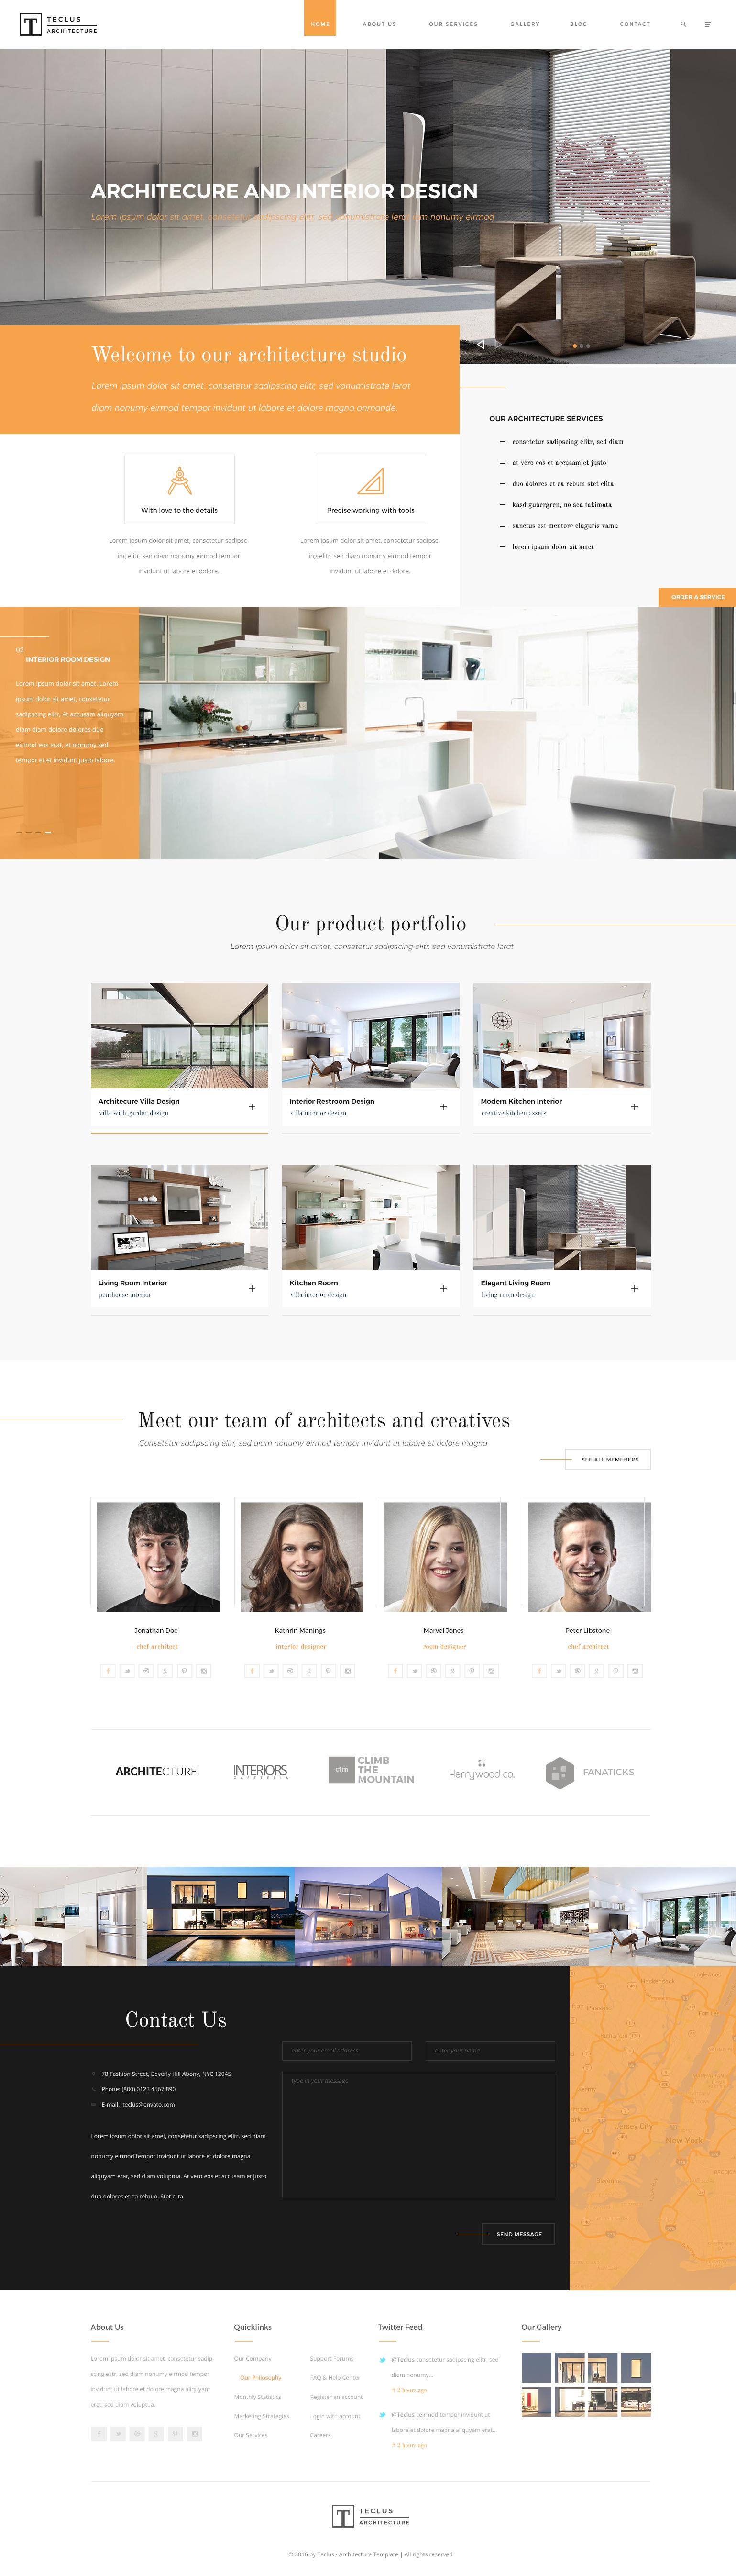 architecture design portfolio layout. Teclus - Architecture PSD Template Design Portfolio Layout